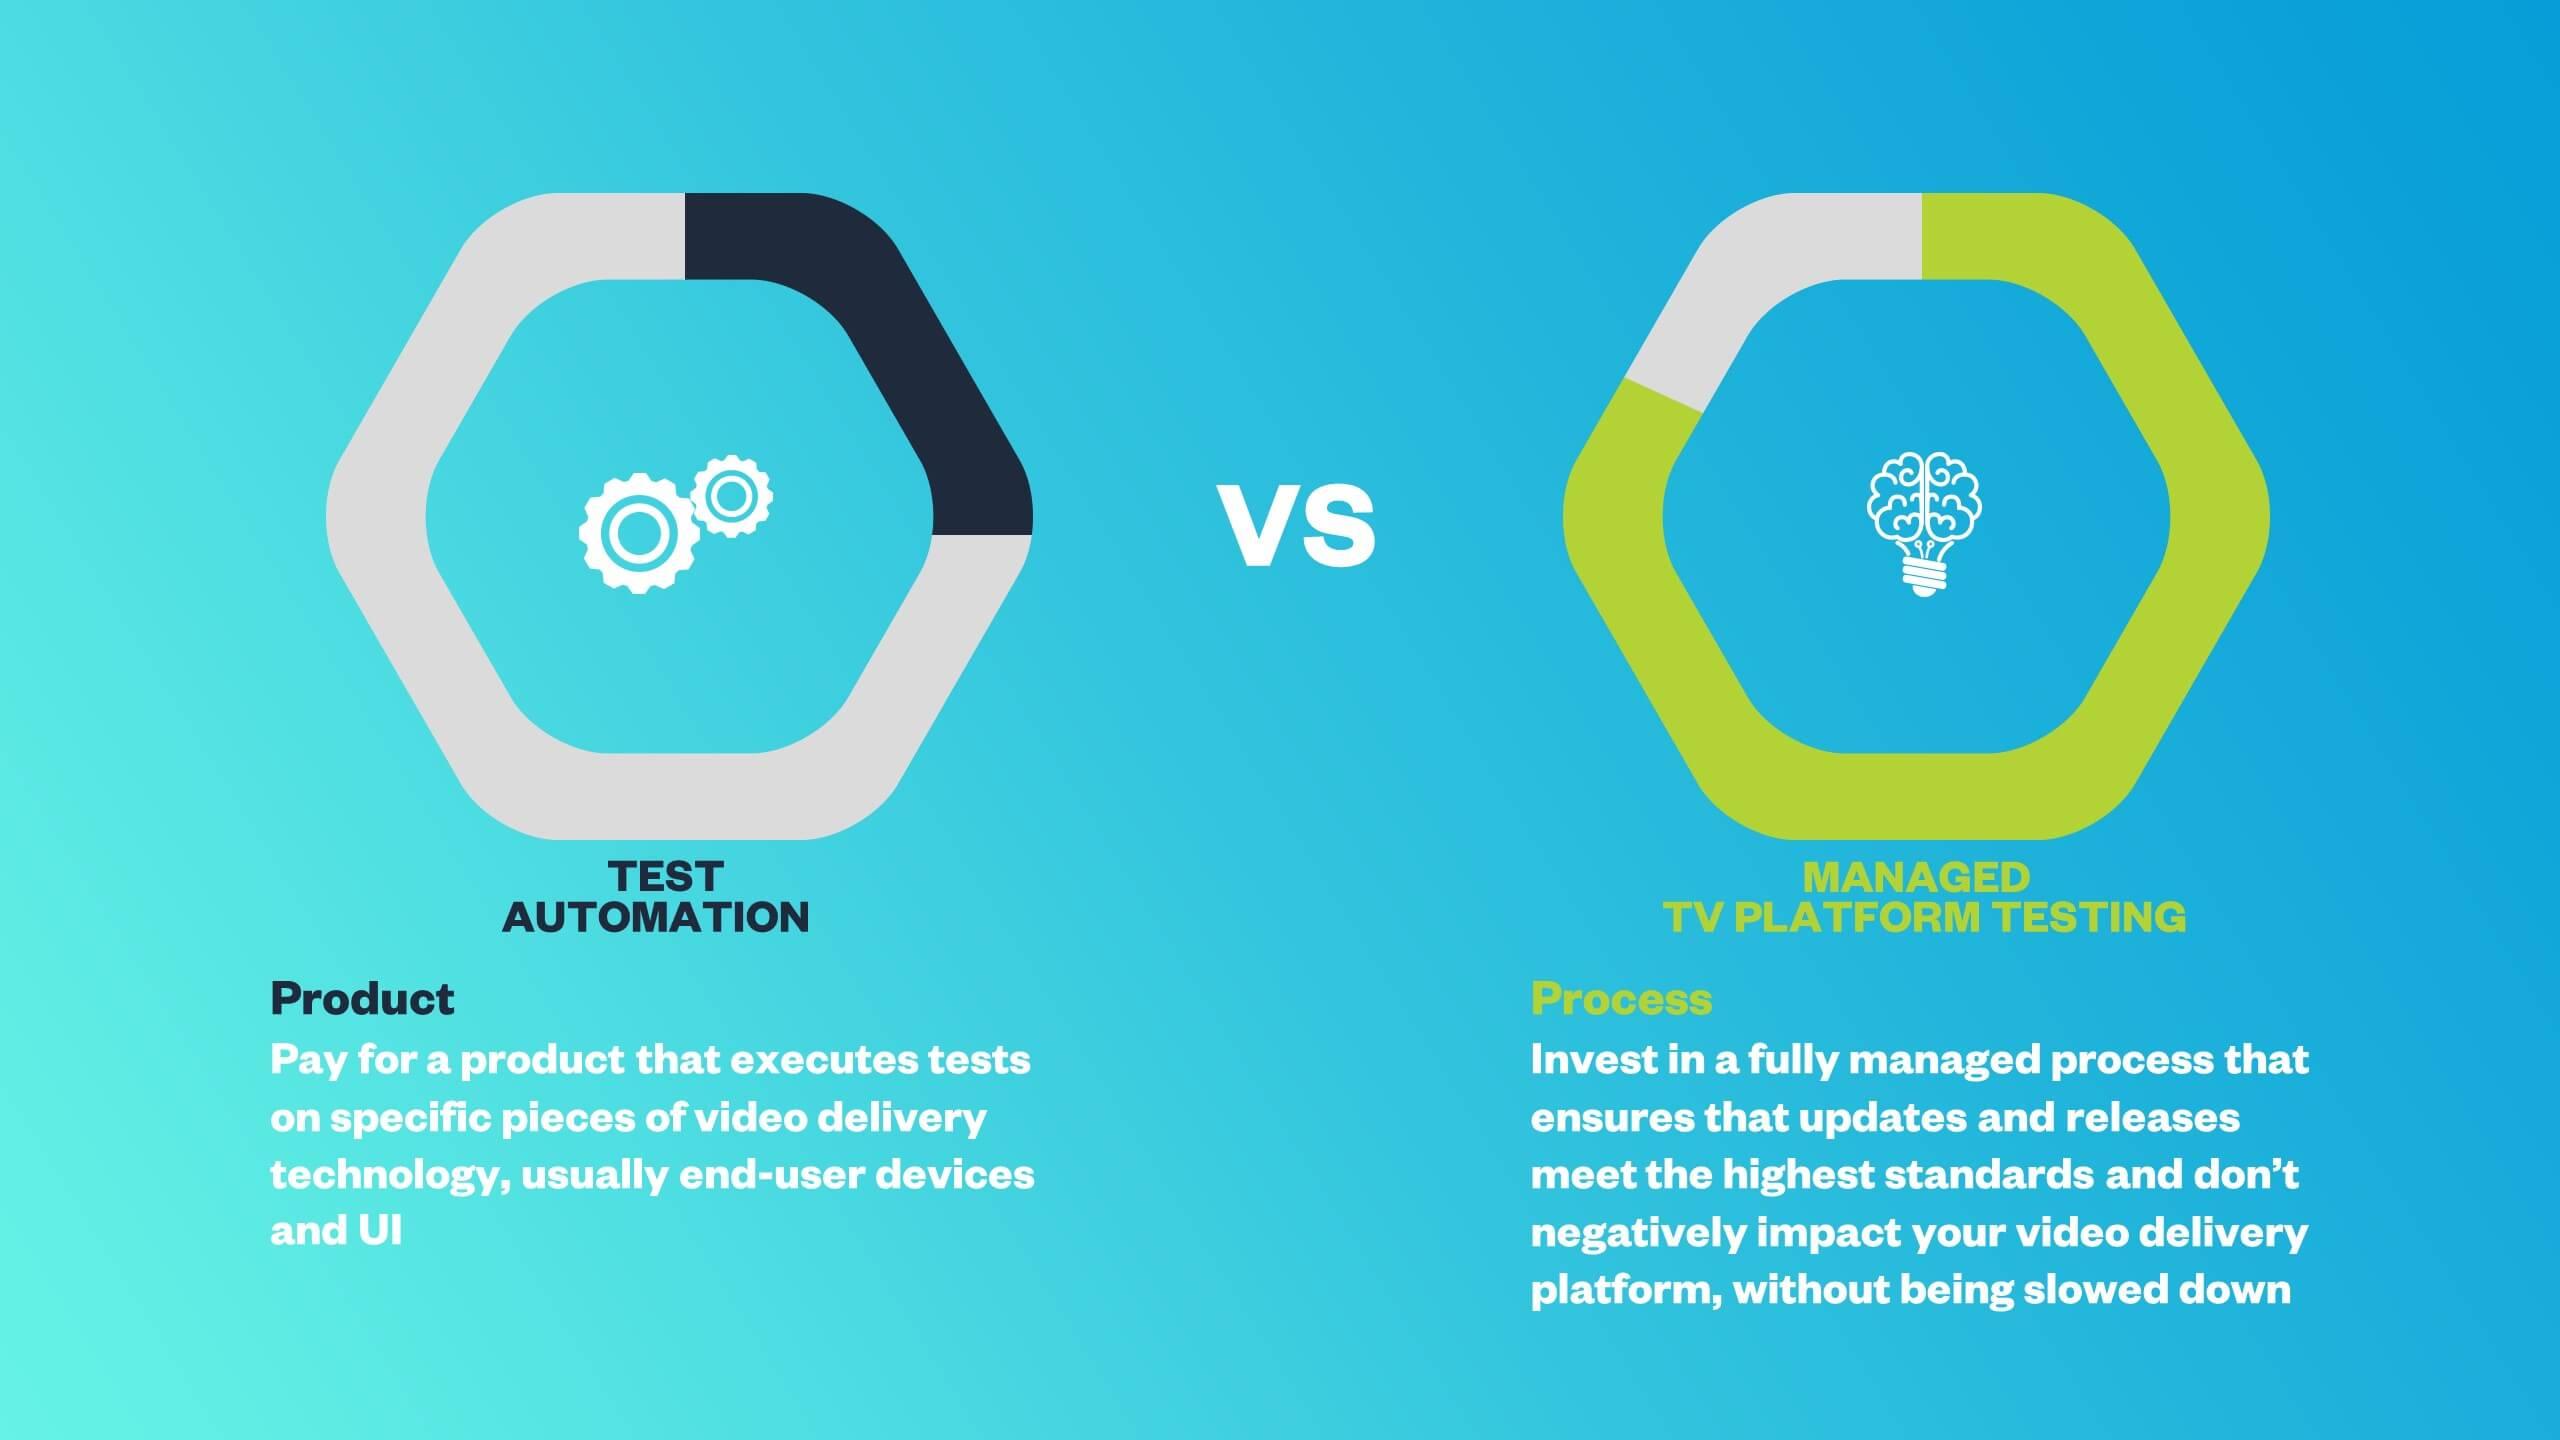 test automation versus managed tv platform testing